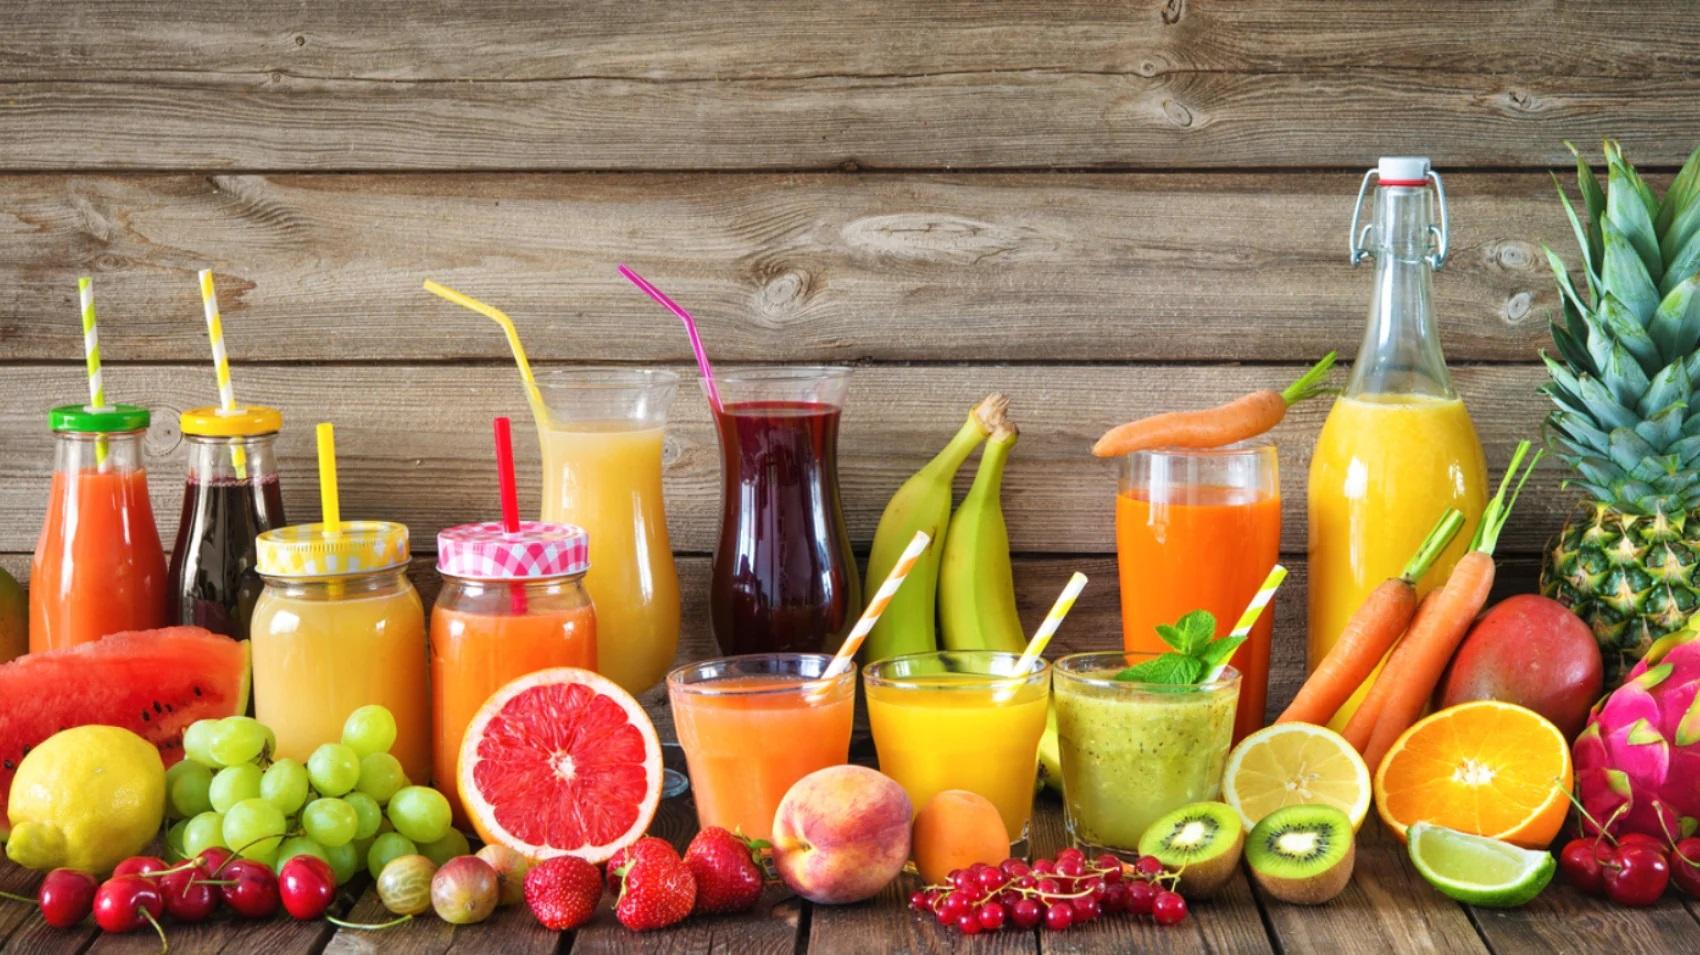 ricette per frullati di frutta e verdura